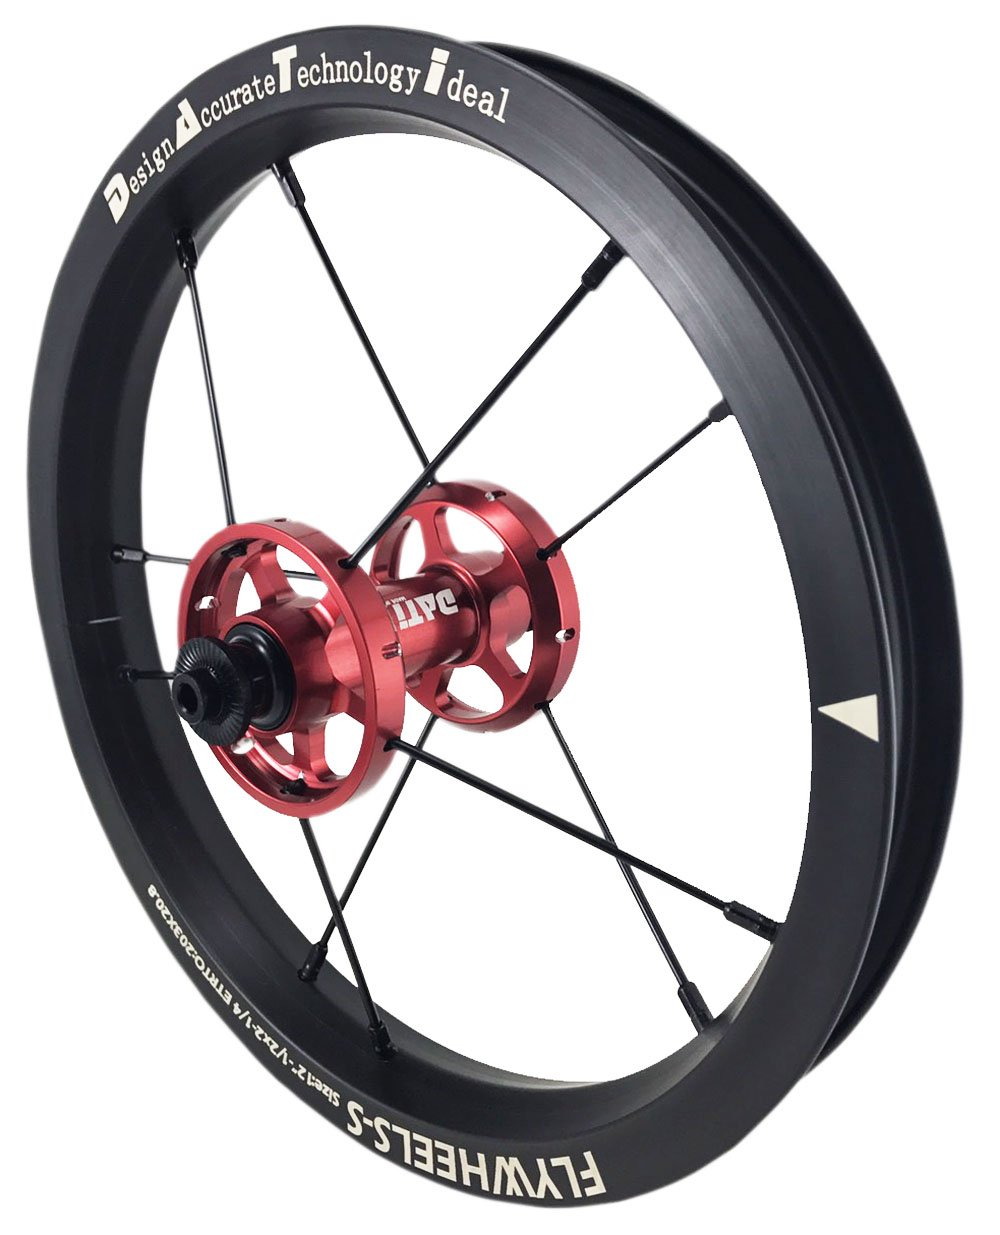 NEW DATI S6A-W AlloyPush Kids Balance Bike Bicycle Super light wheels Set 12'' F+R (RED, 95X8mm) by DATI